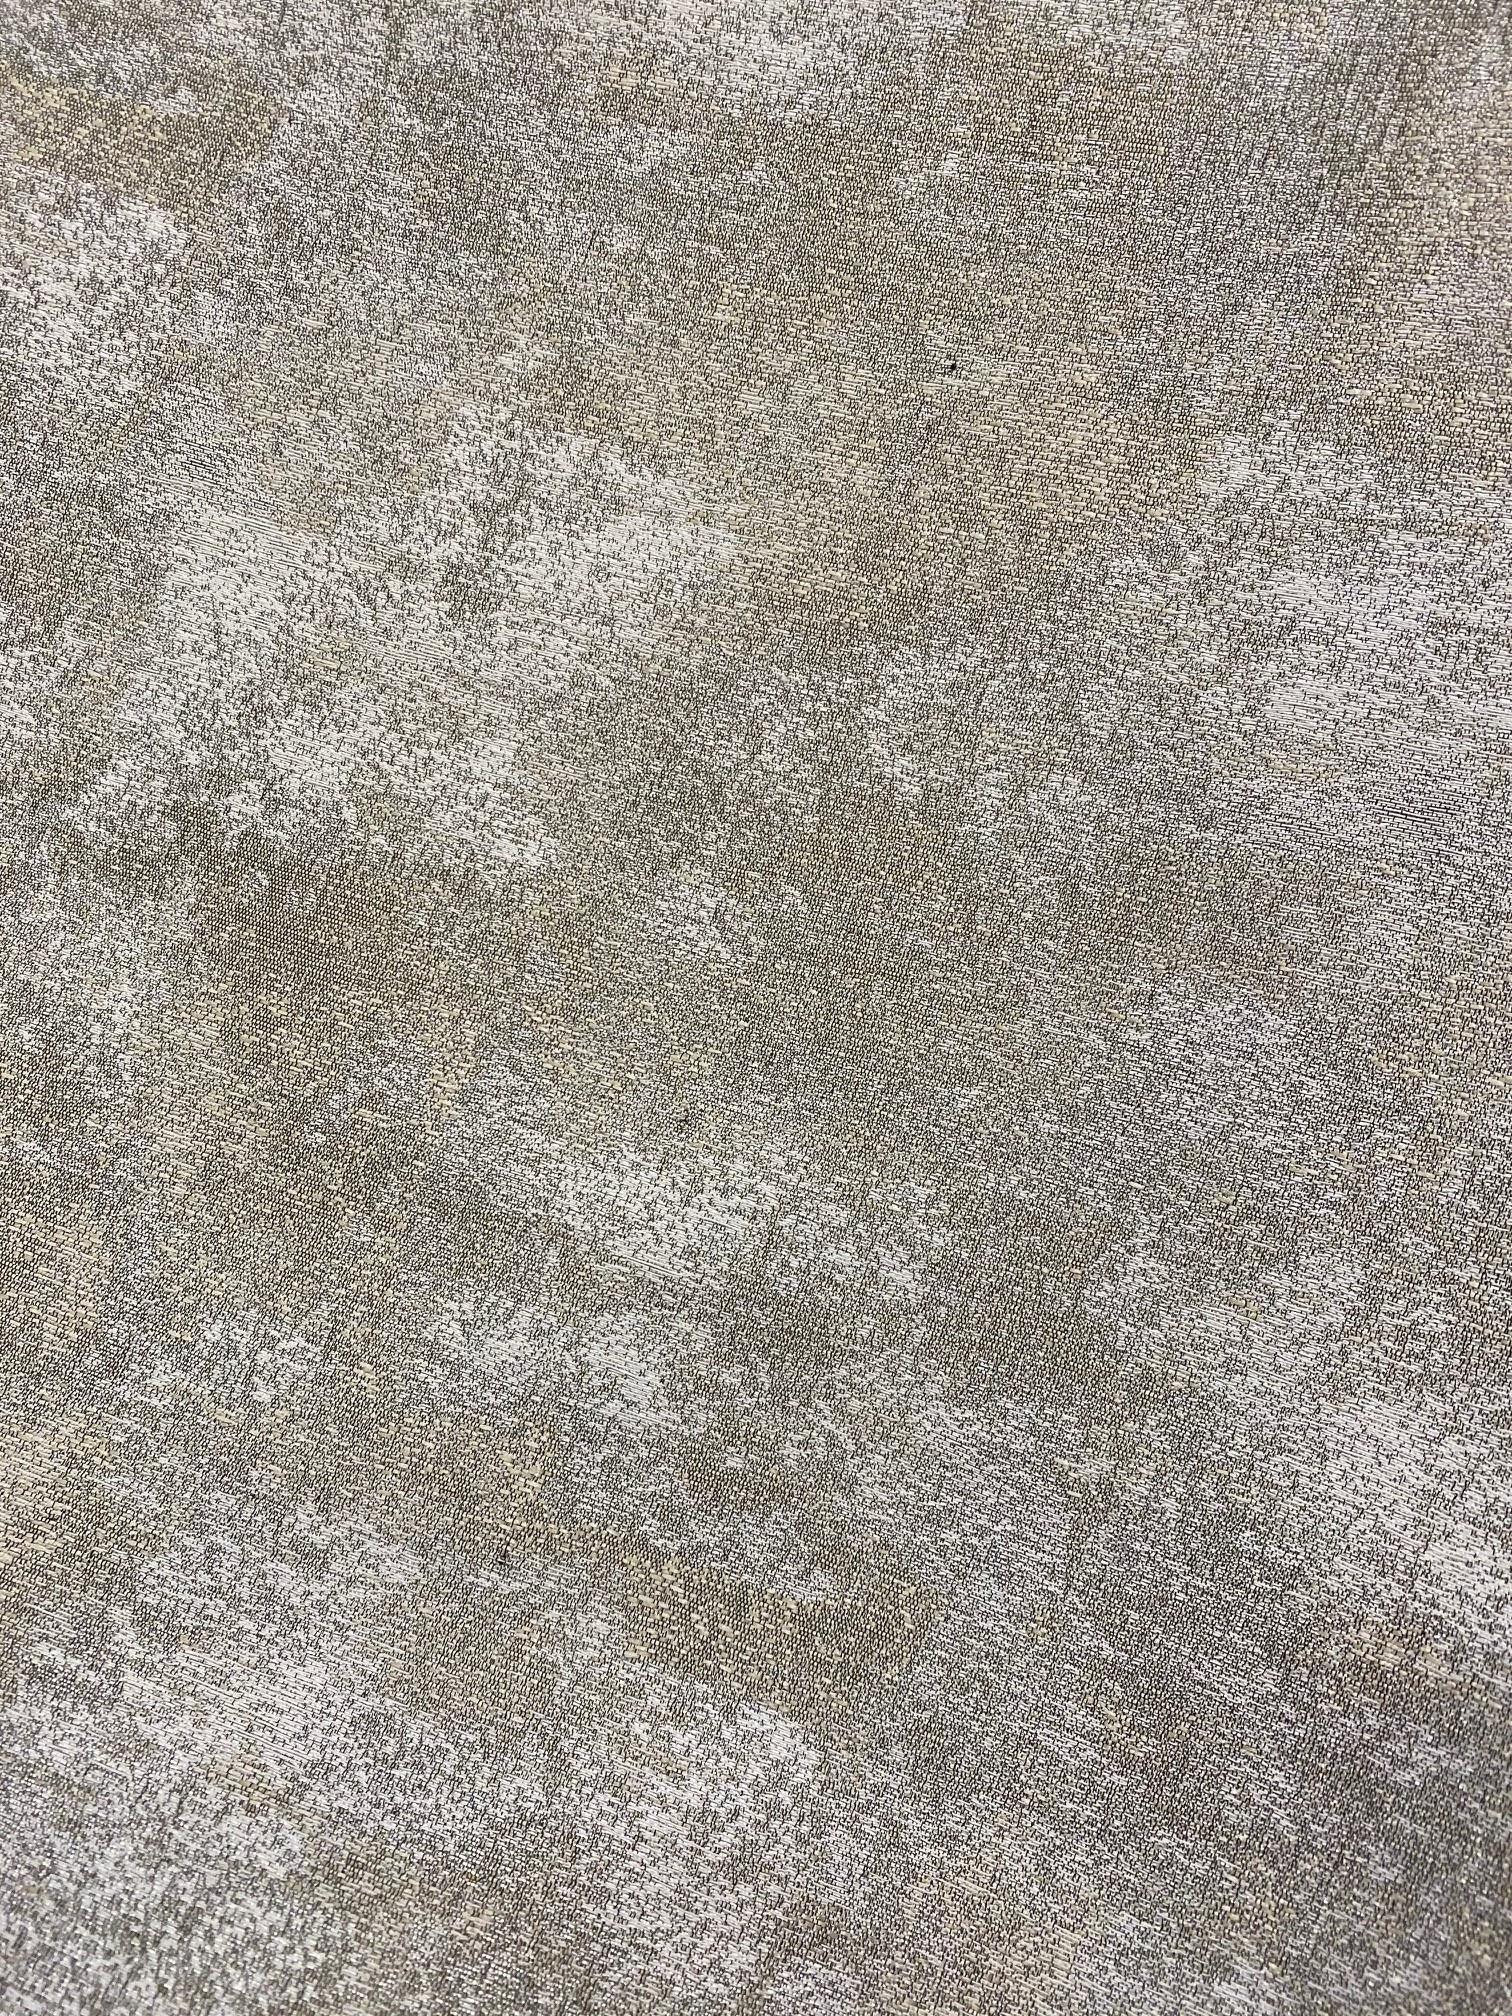 Jacquard Grey/Silver TC1300 70 x 144 Tablecloth